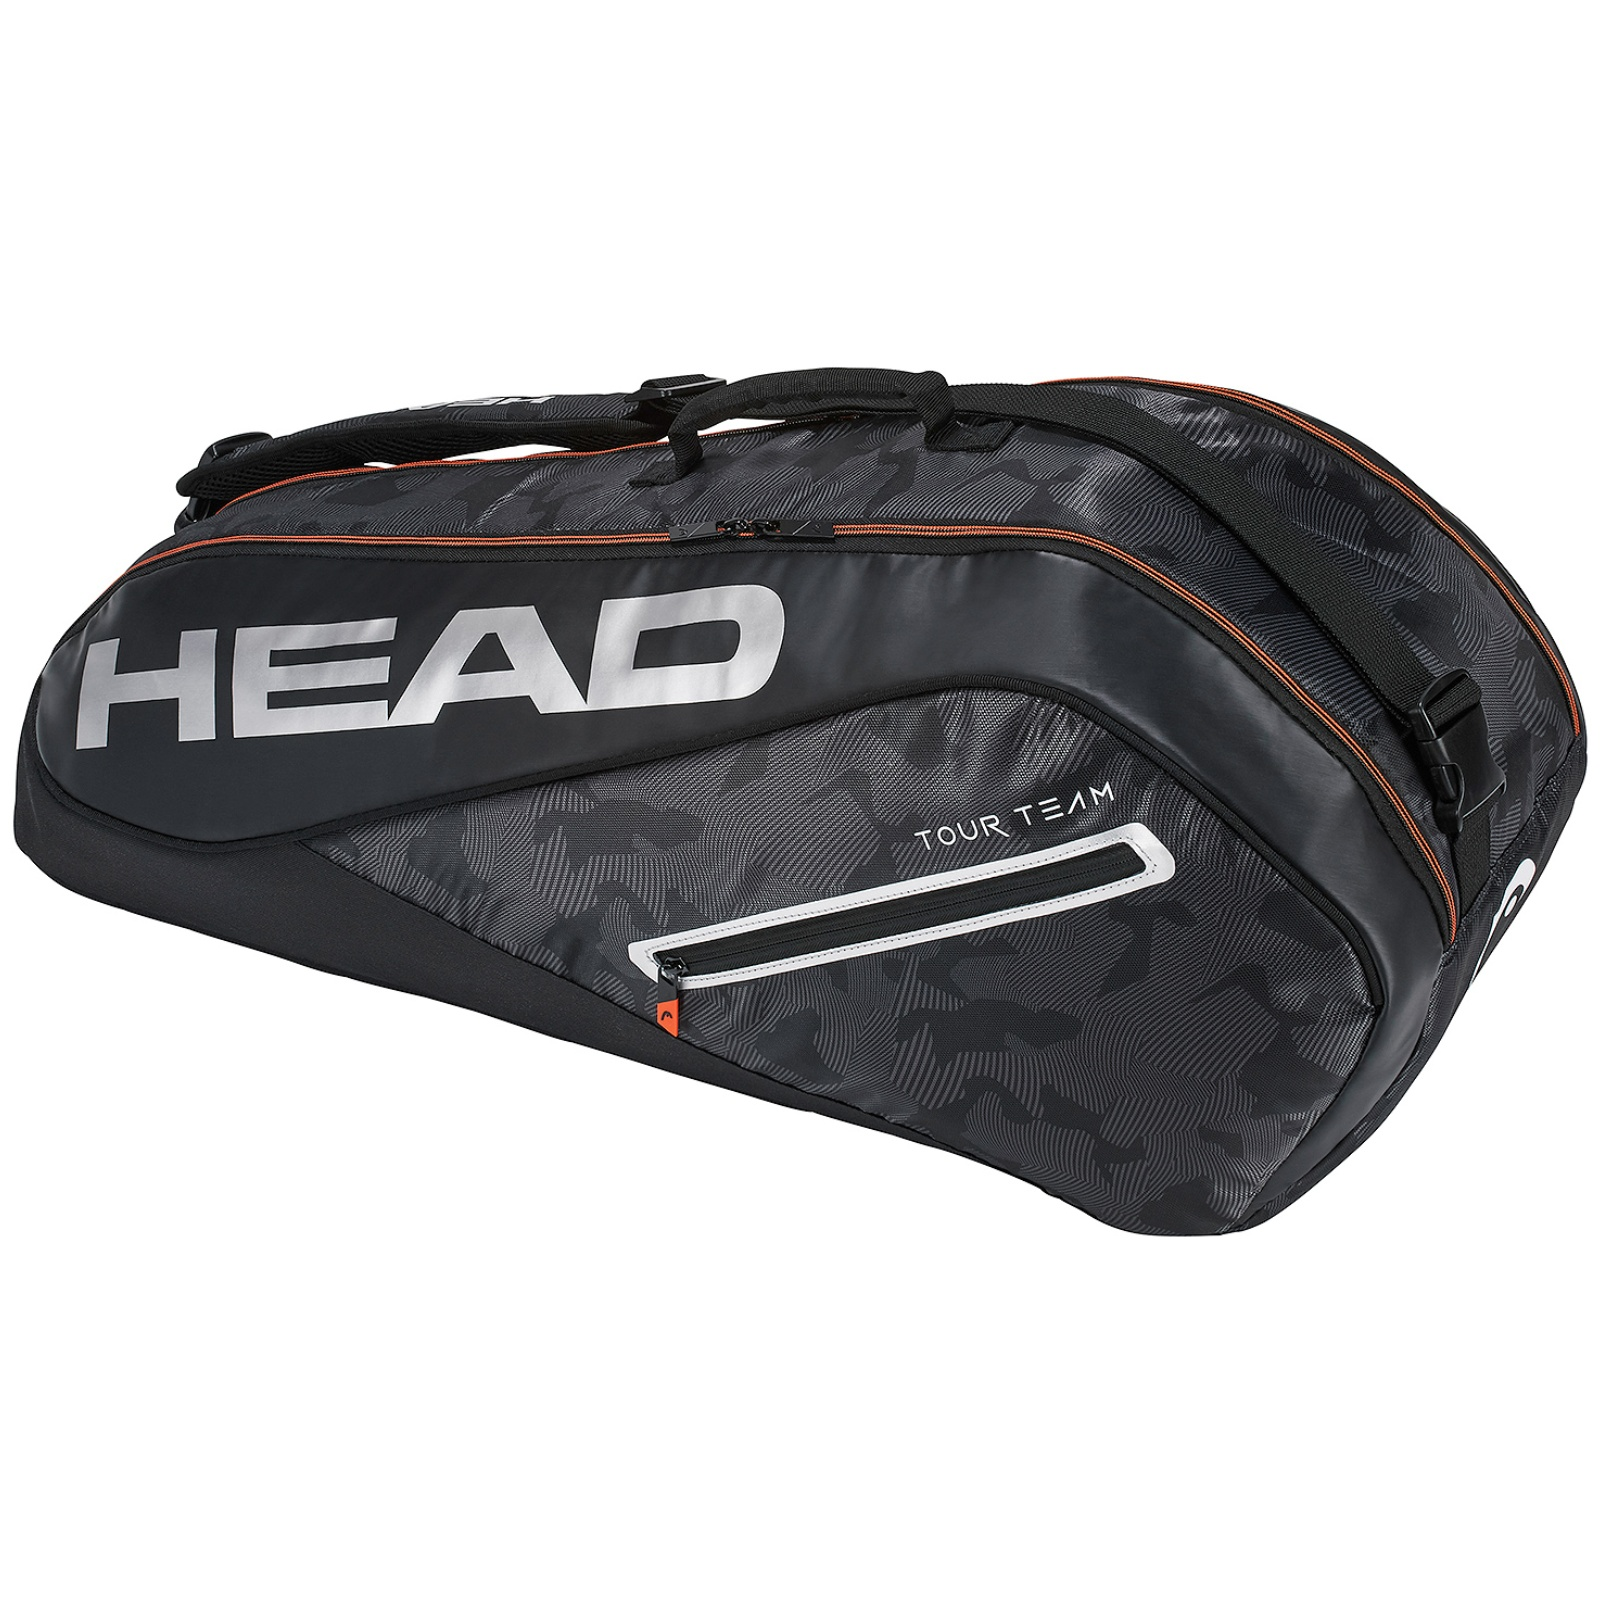 Tenisová taška HEAD Tour 6R Combi - čierna